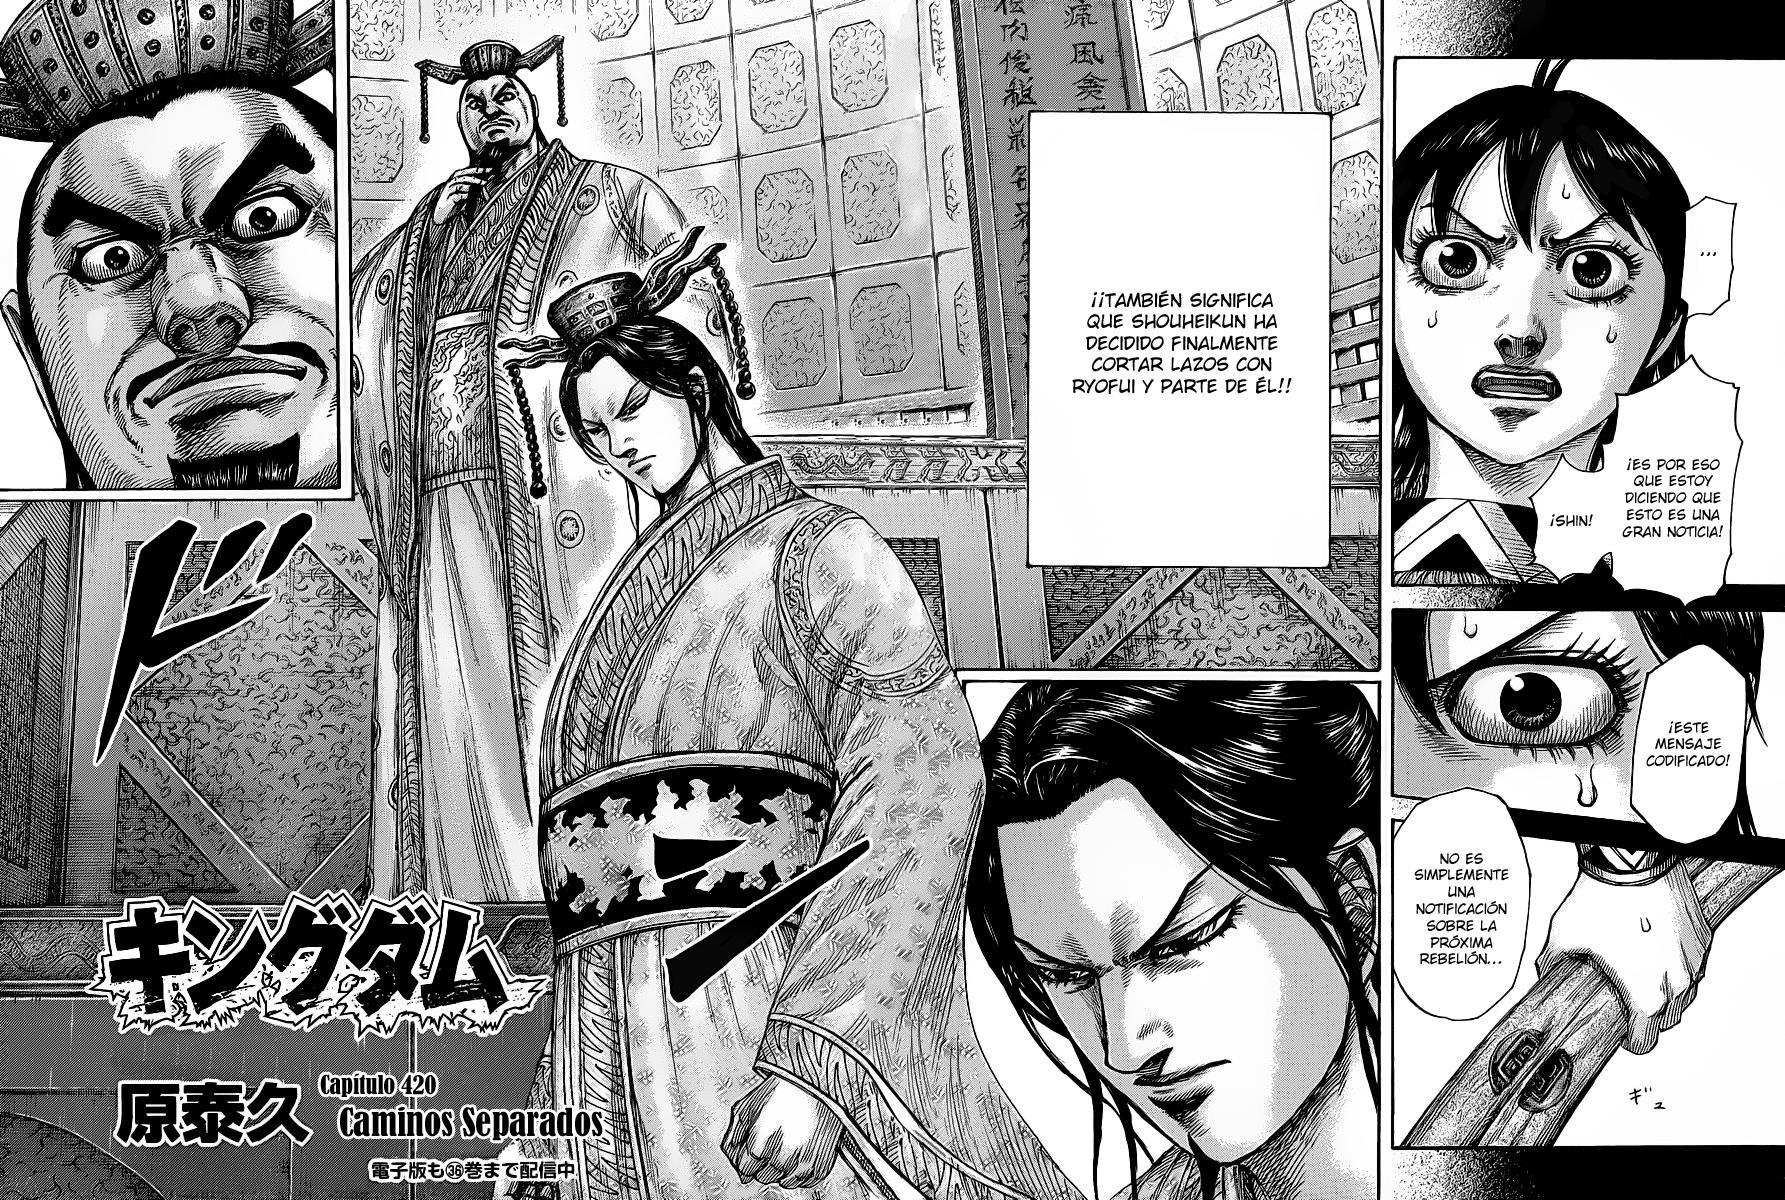 http://c5.ninemanga.com/es_manga/19/12307/363062/a6f6b649715373a58392de57da7b4dff.jpg Page 5